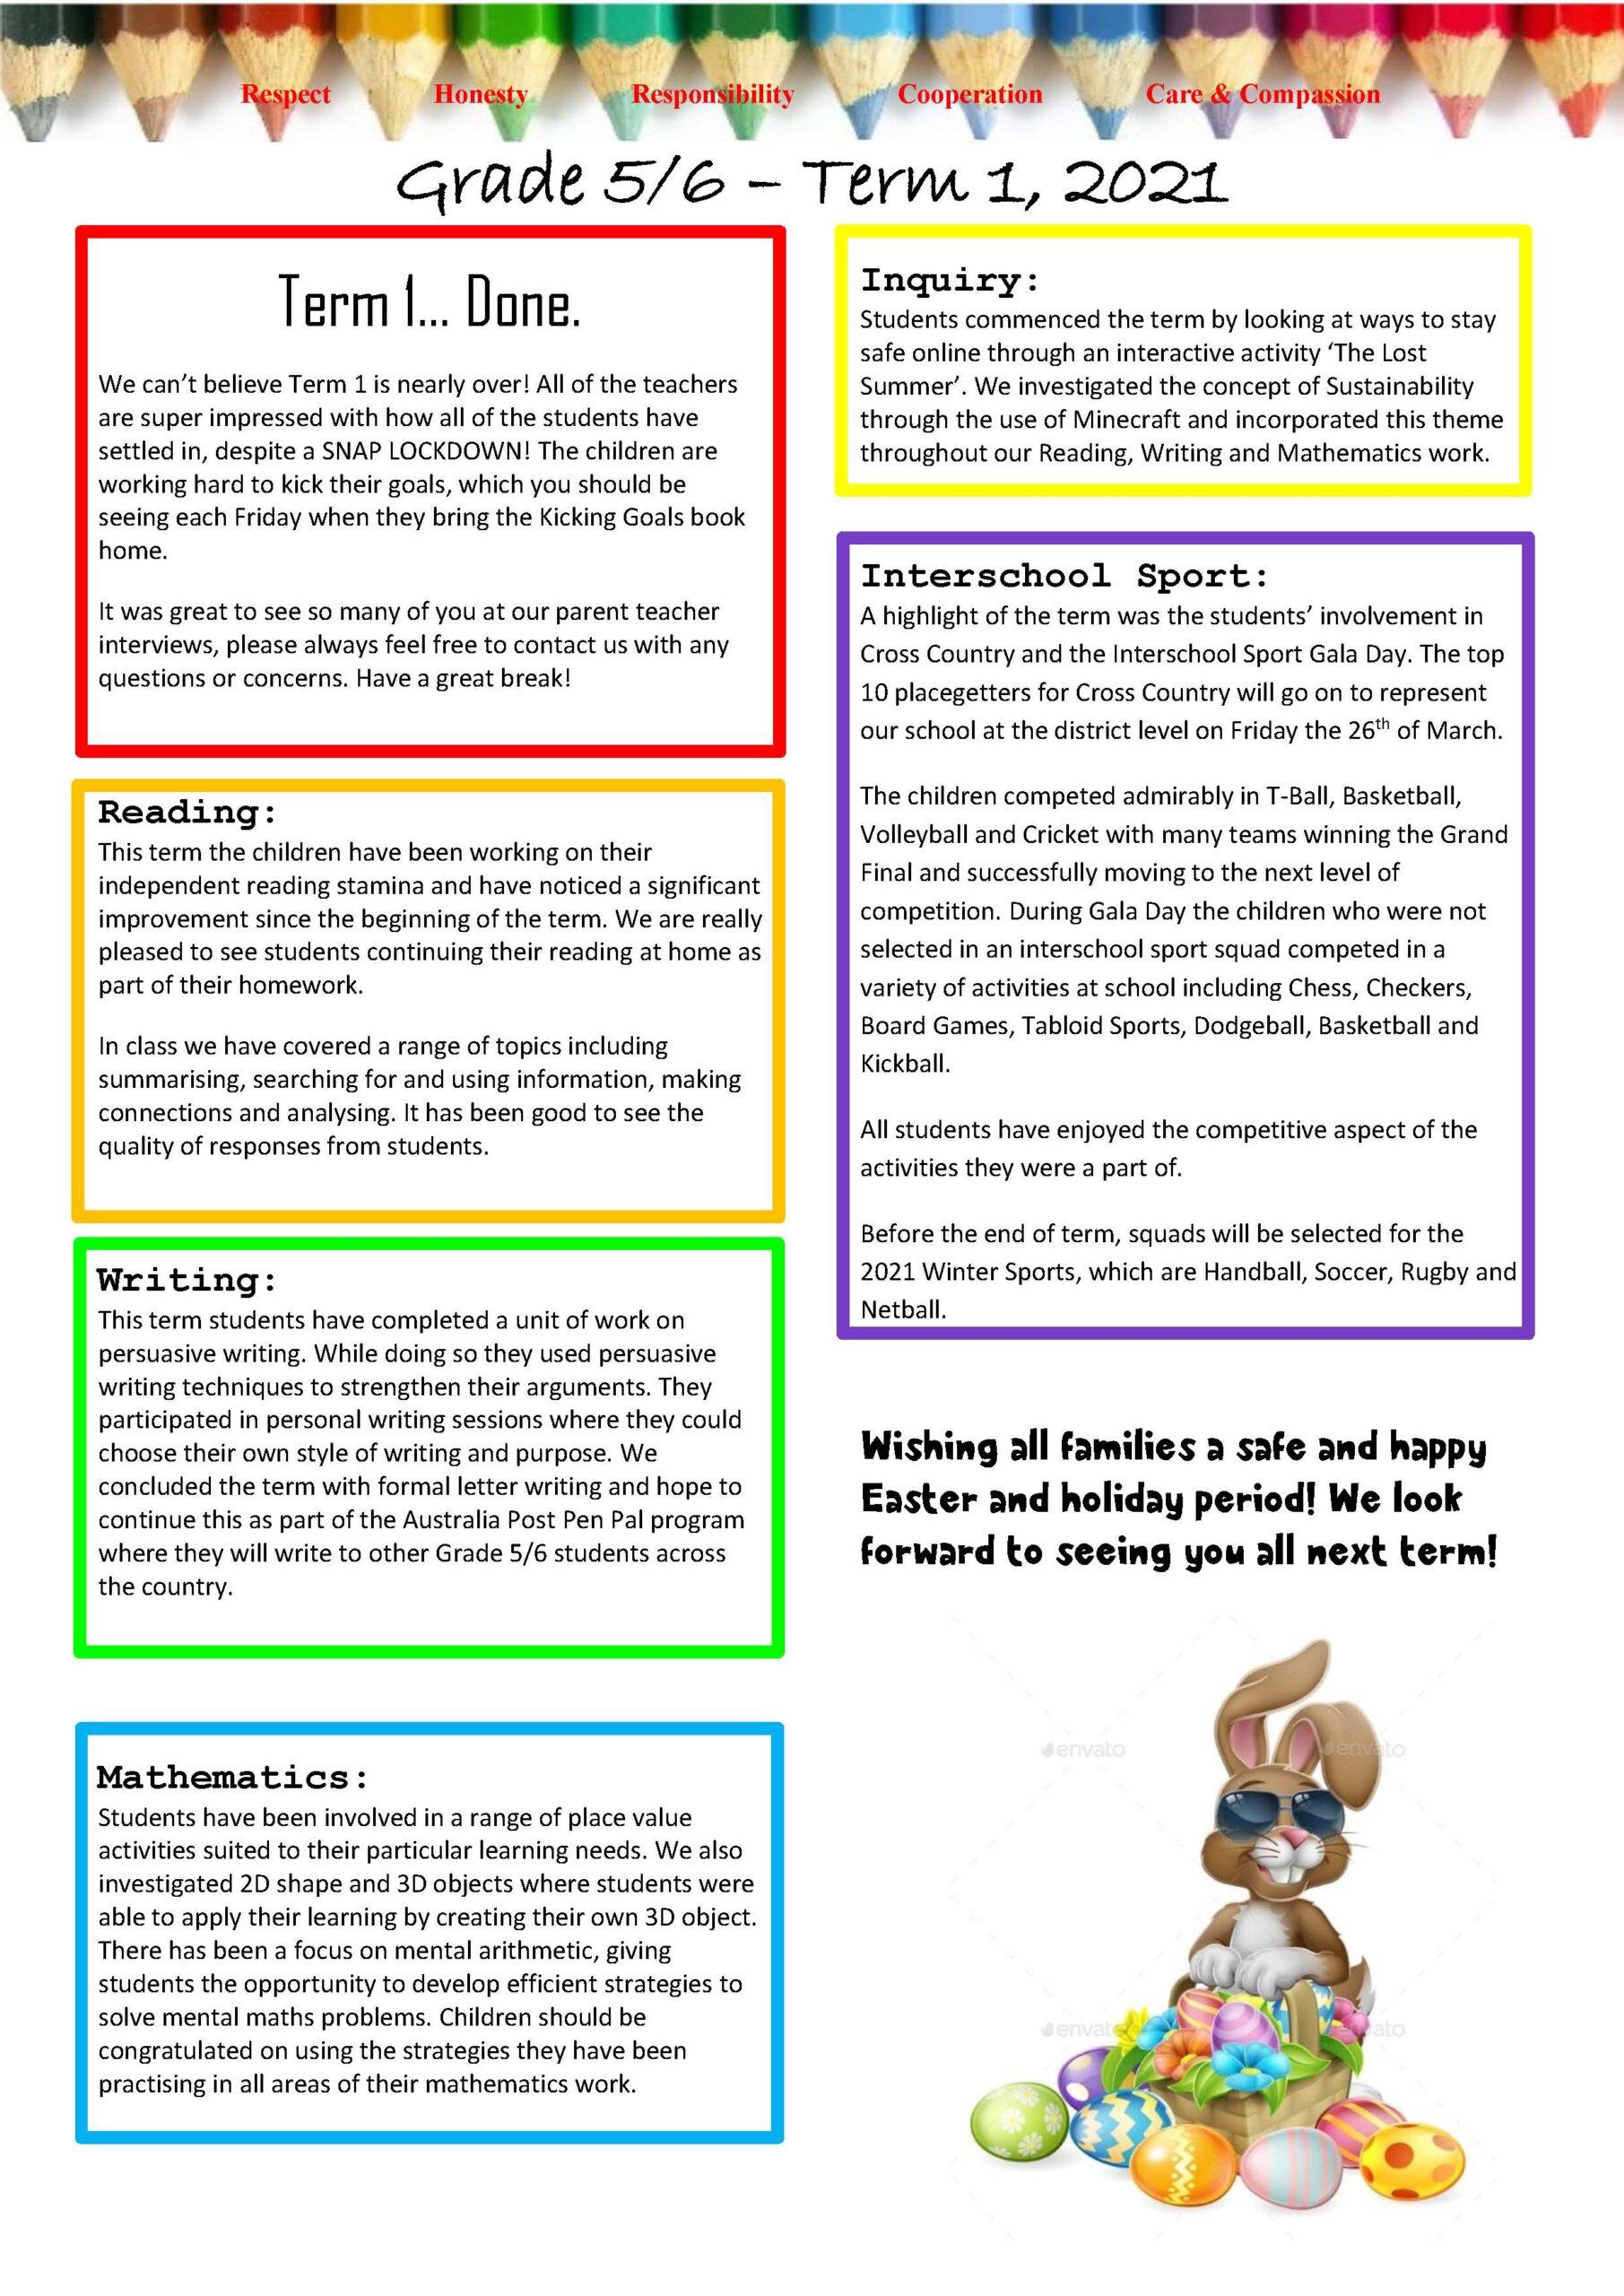 Grade 5/6 Term 1, 2021 Overview